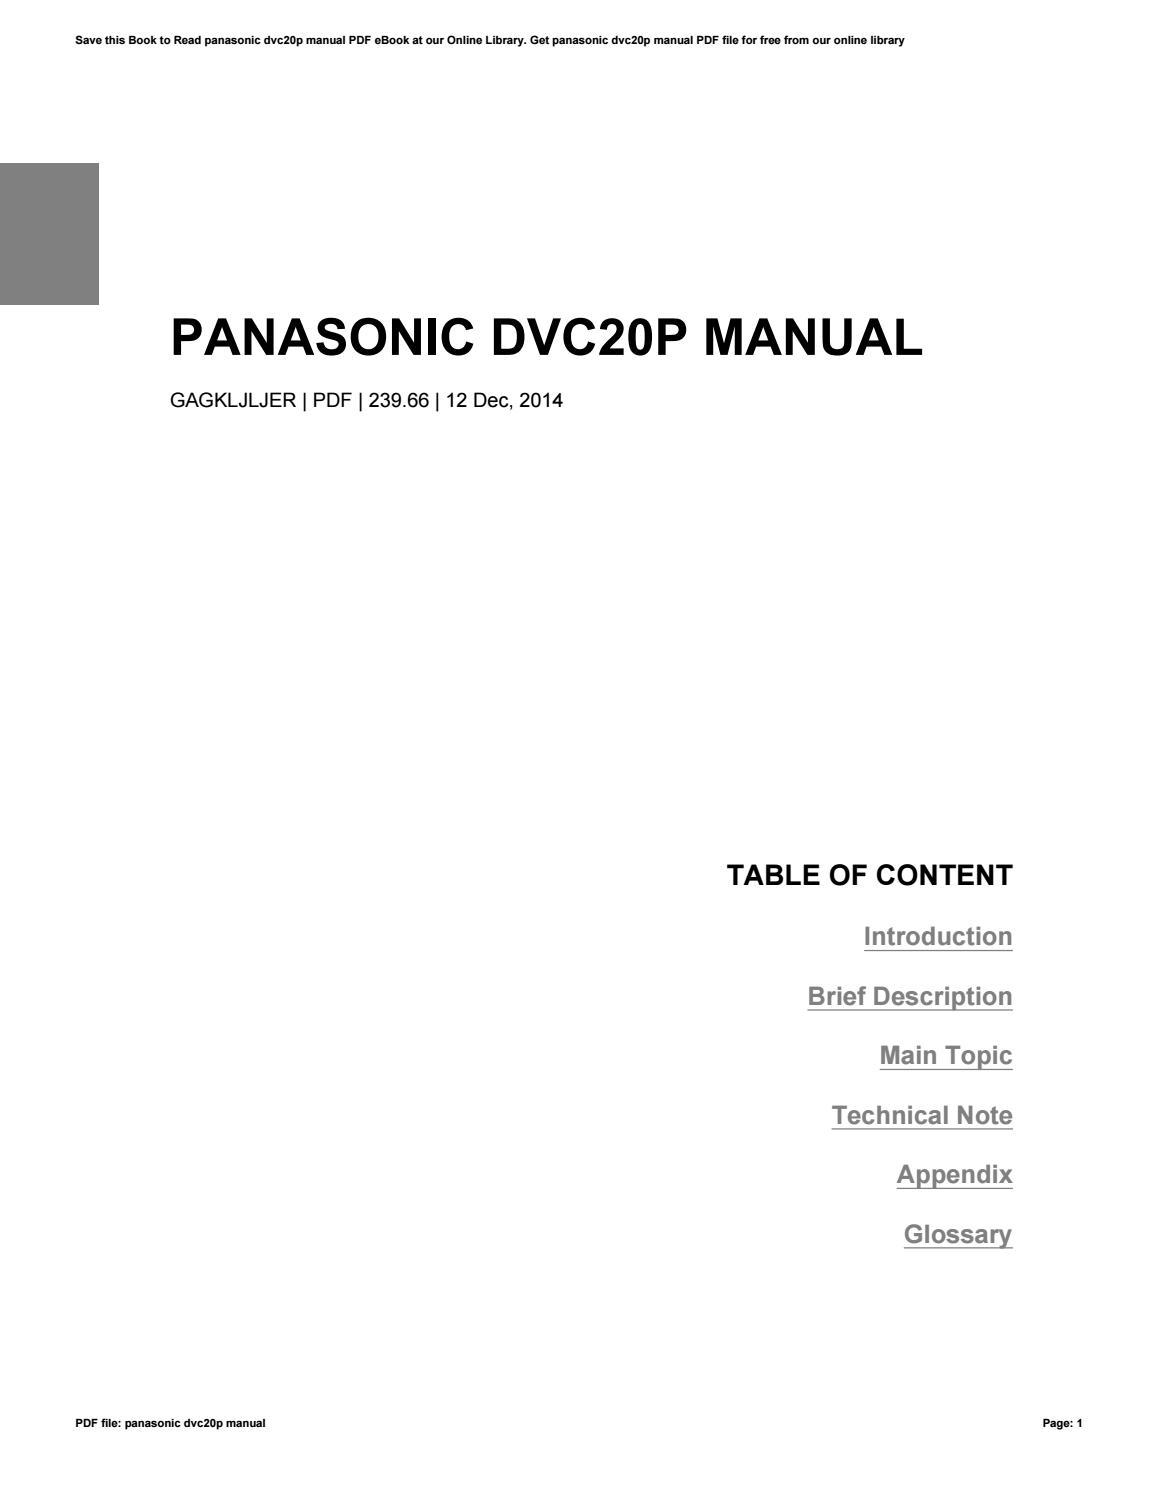 panasonic dvc20p manual by johnnieparr2639 issuu rh issuu com Panasonic Owner's Manual Panasonic.comsupportbycncompass